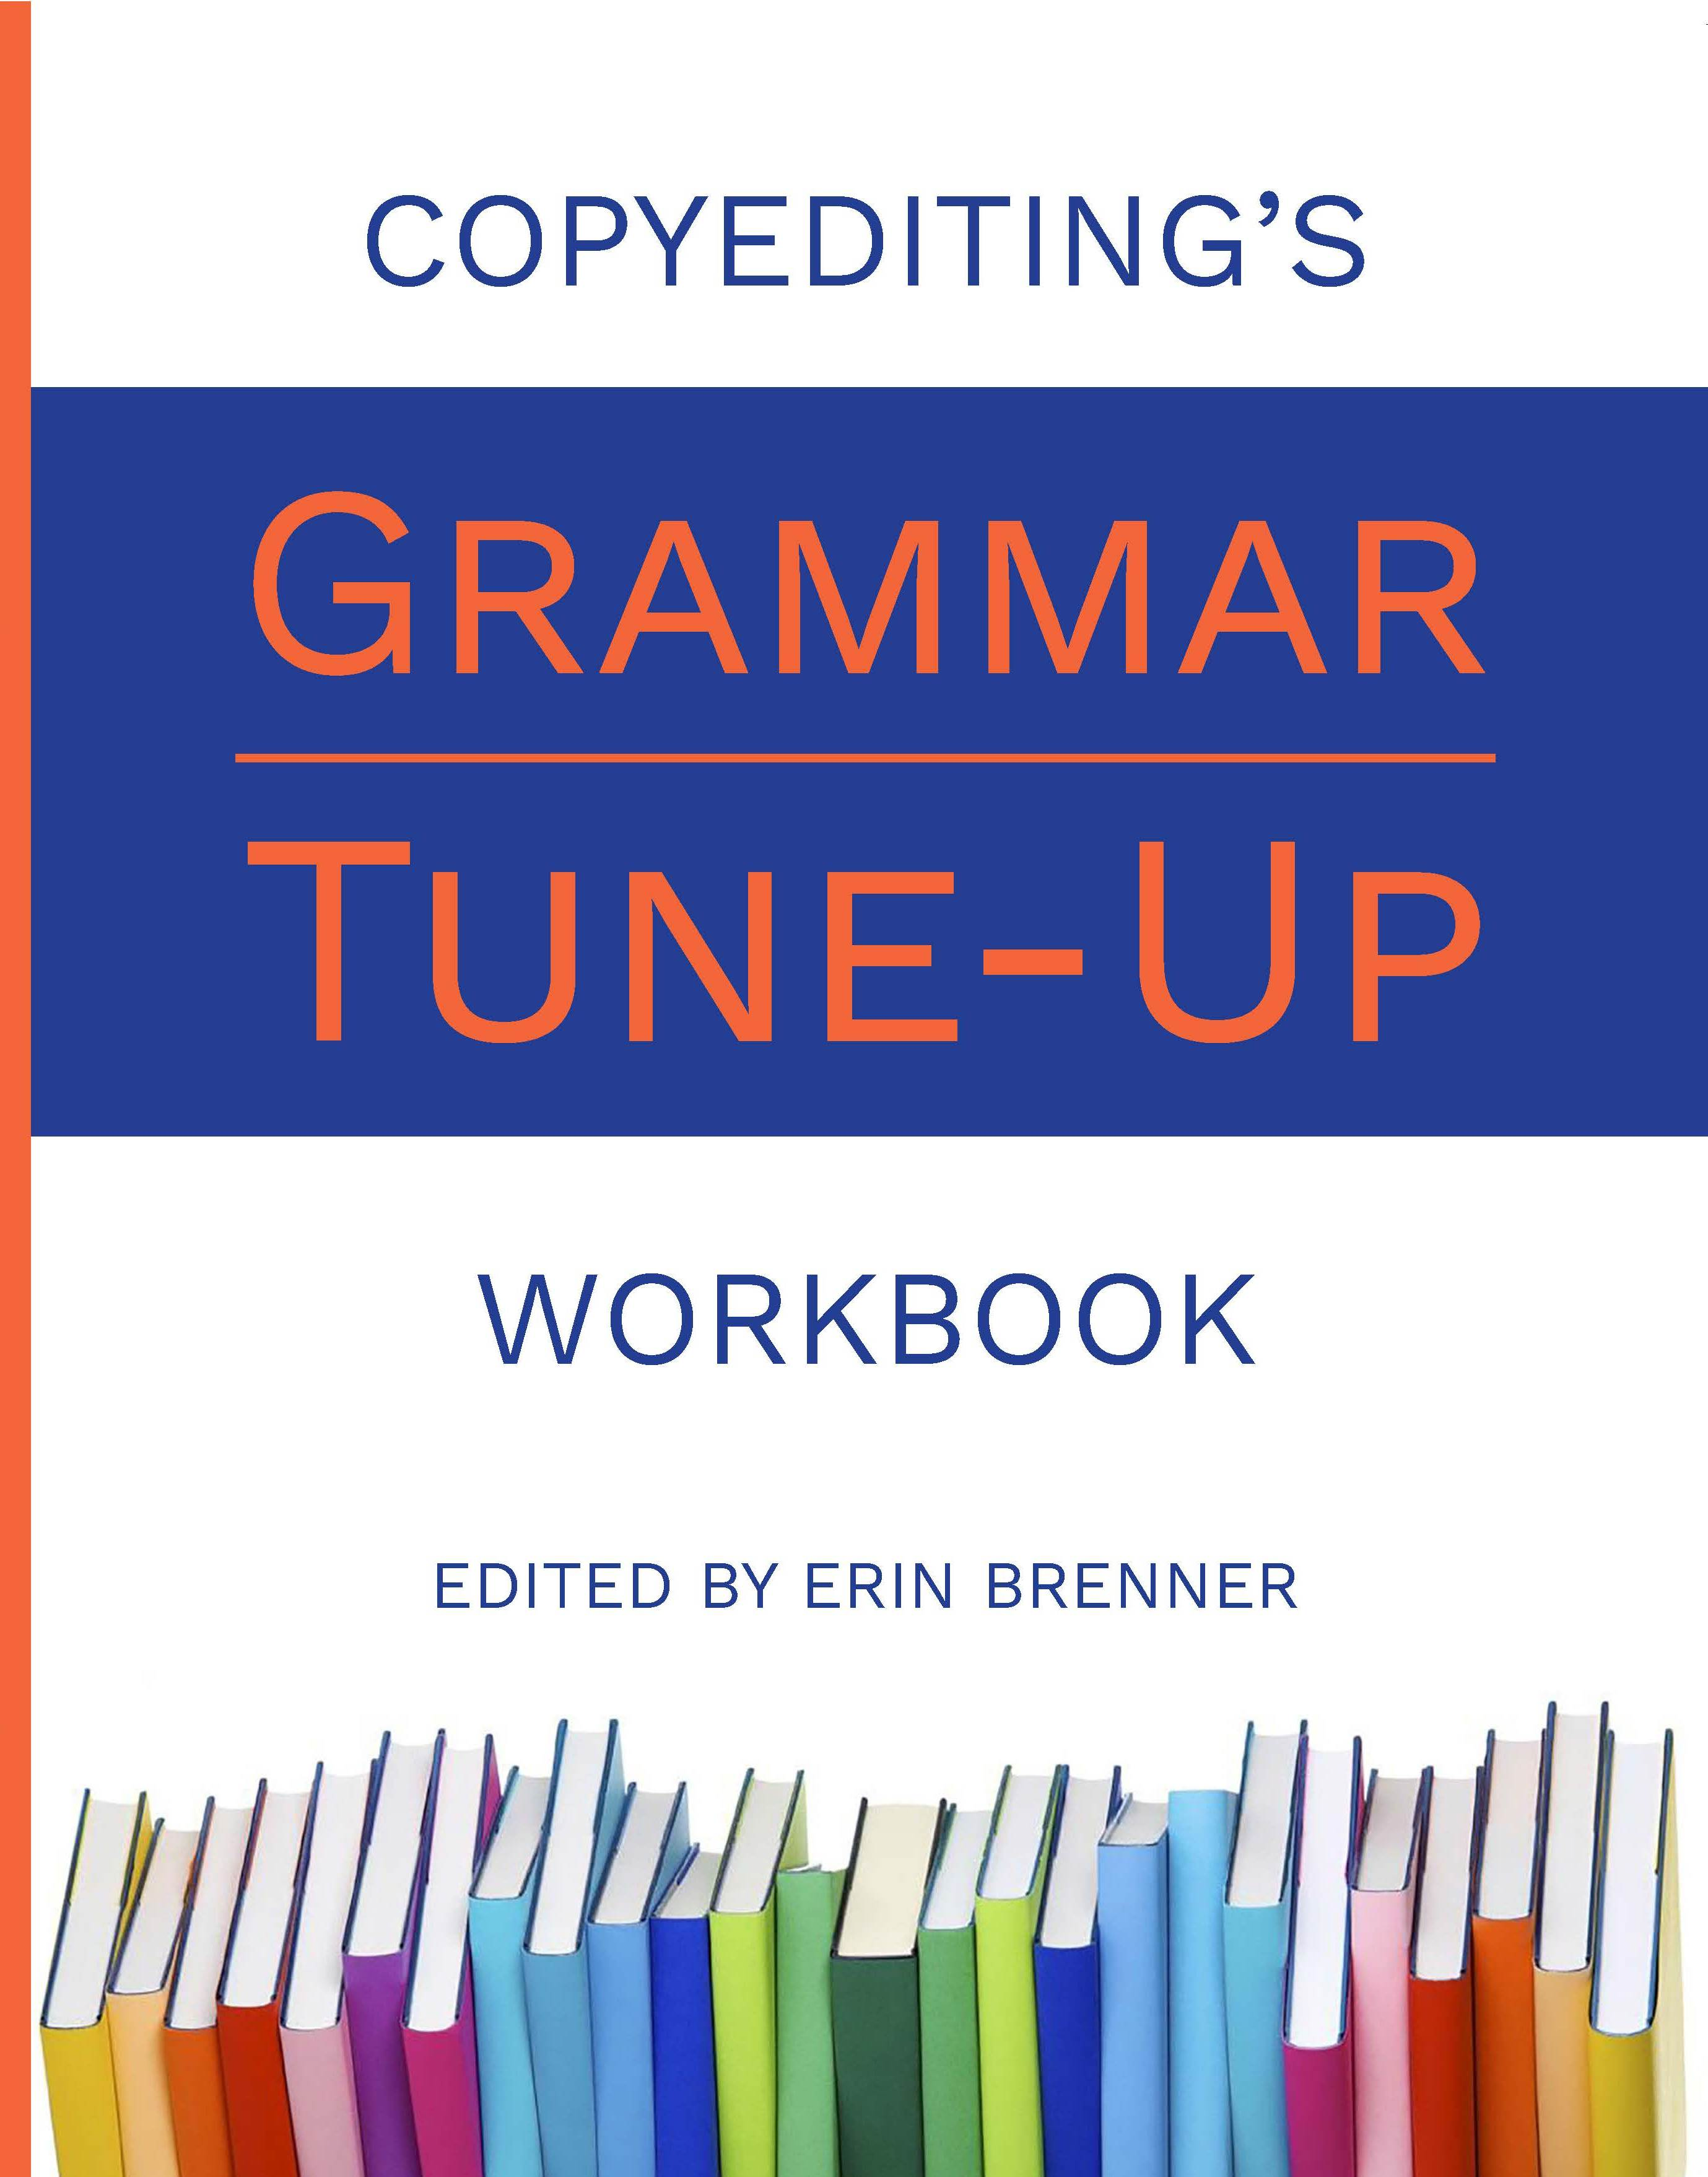 Copyediting's Grammar Tune-Up Workbook cover